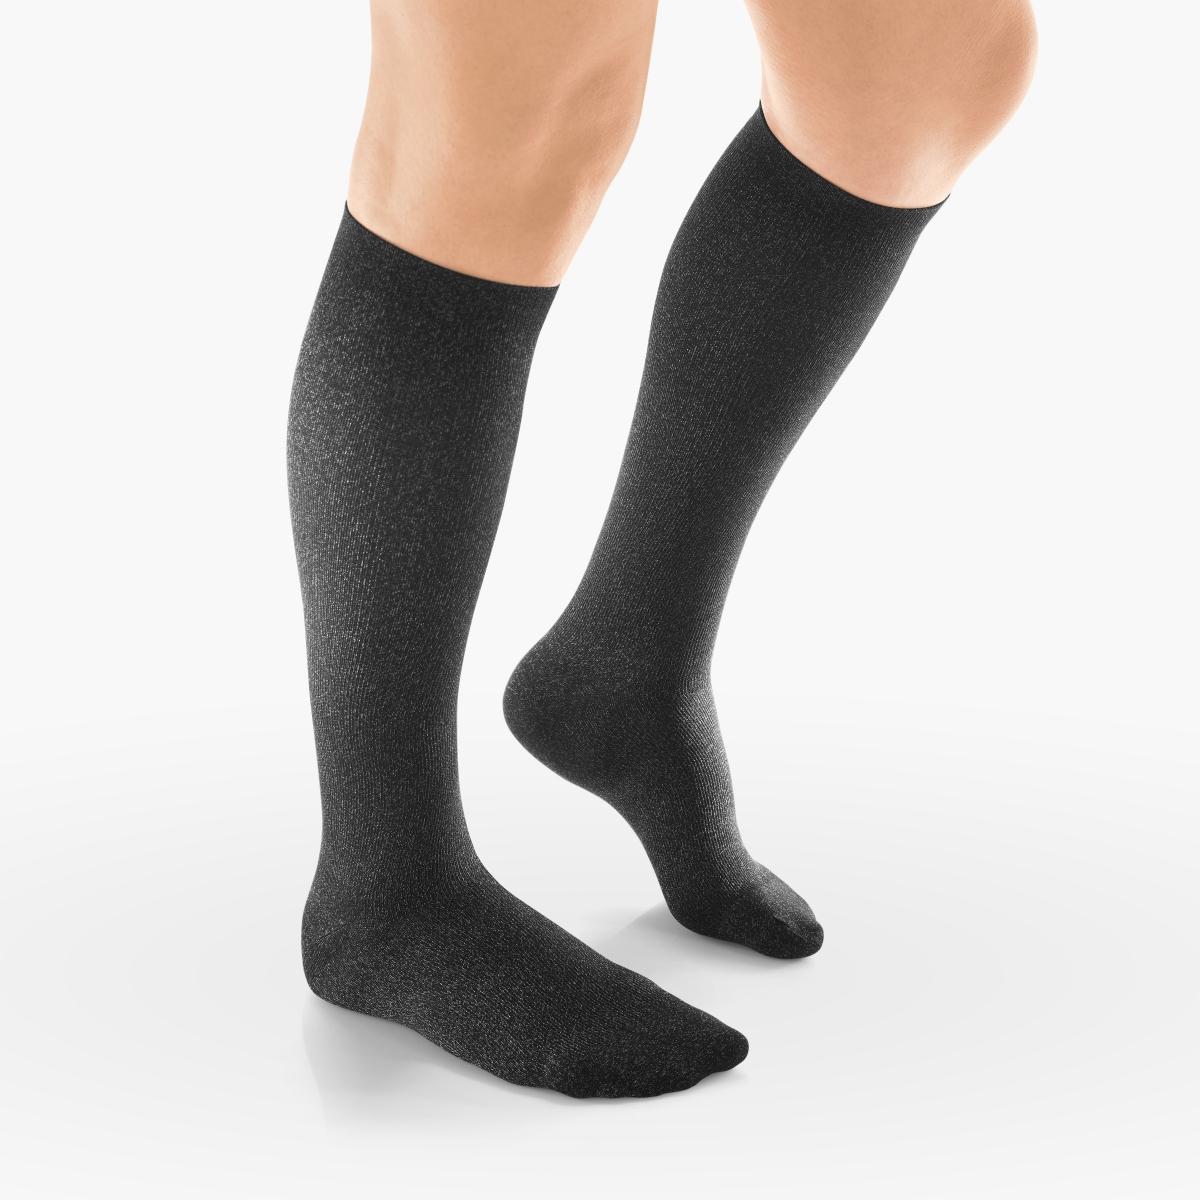 VENOSAN Silverline F Women, Below Knee 20-30, Black, S, Firm 20-30 mmHg | Black | S |  | Closed Toe | Knit Top